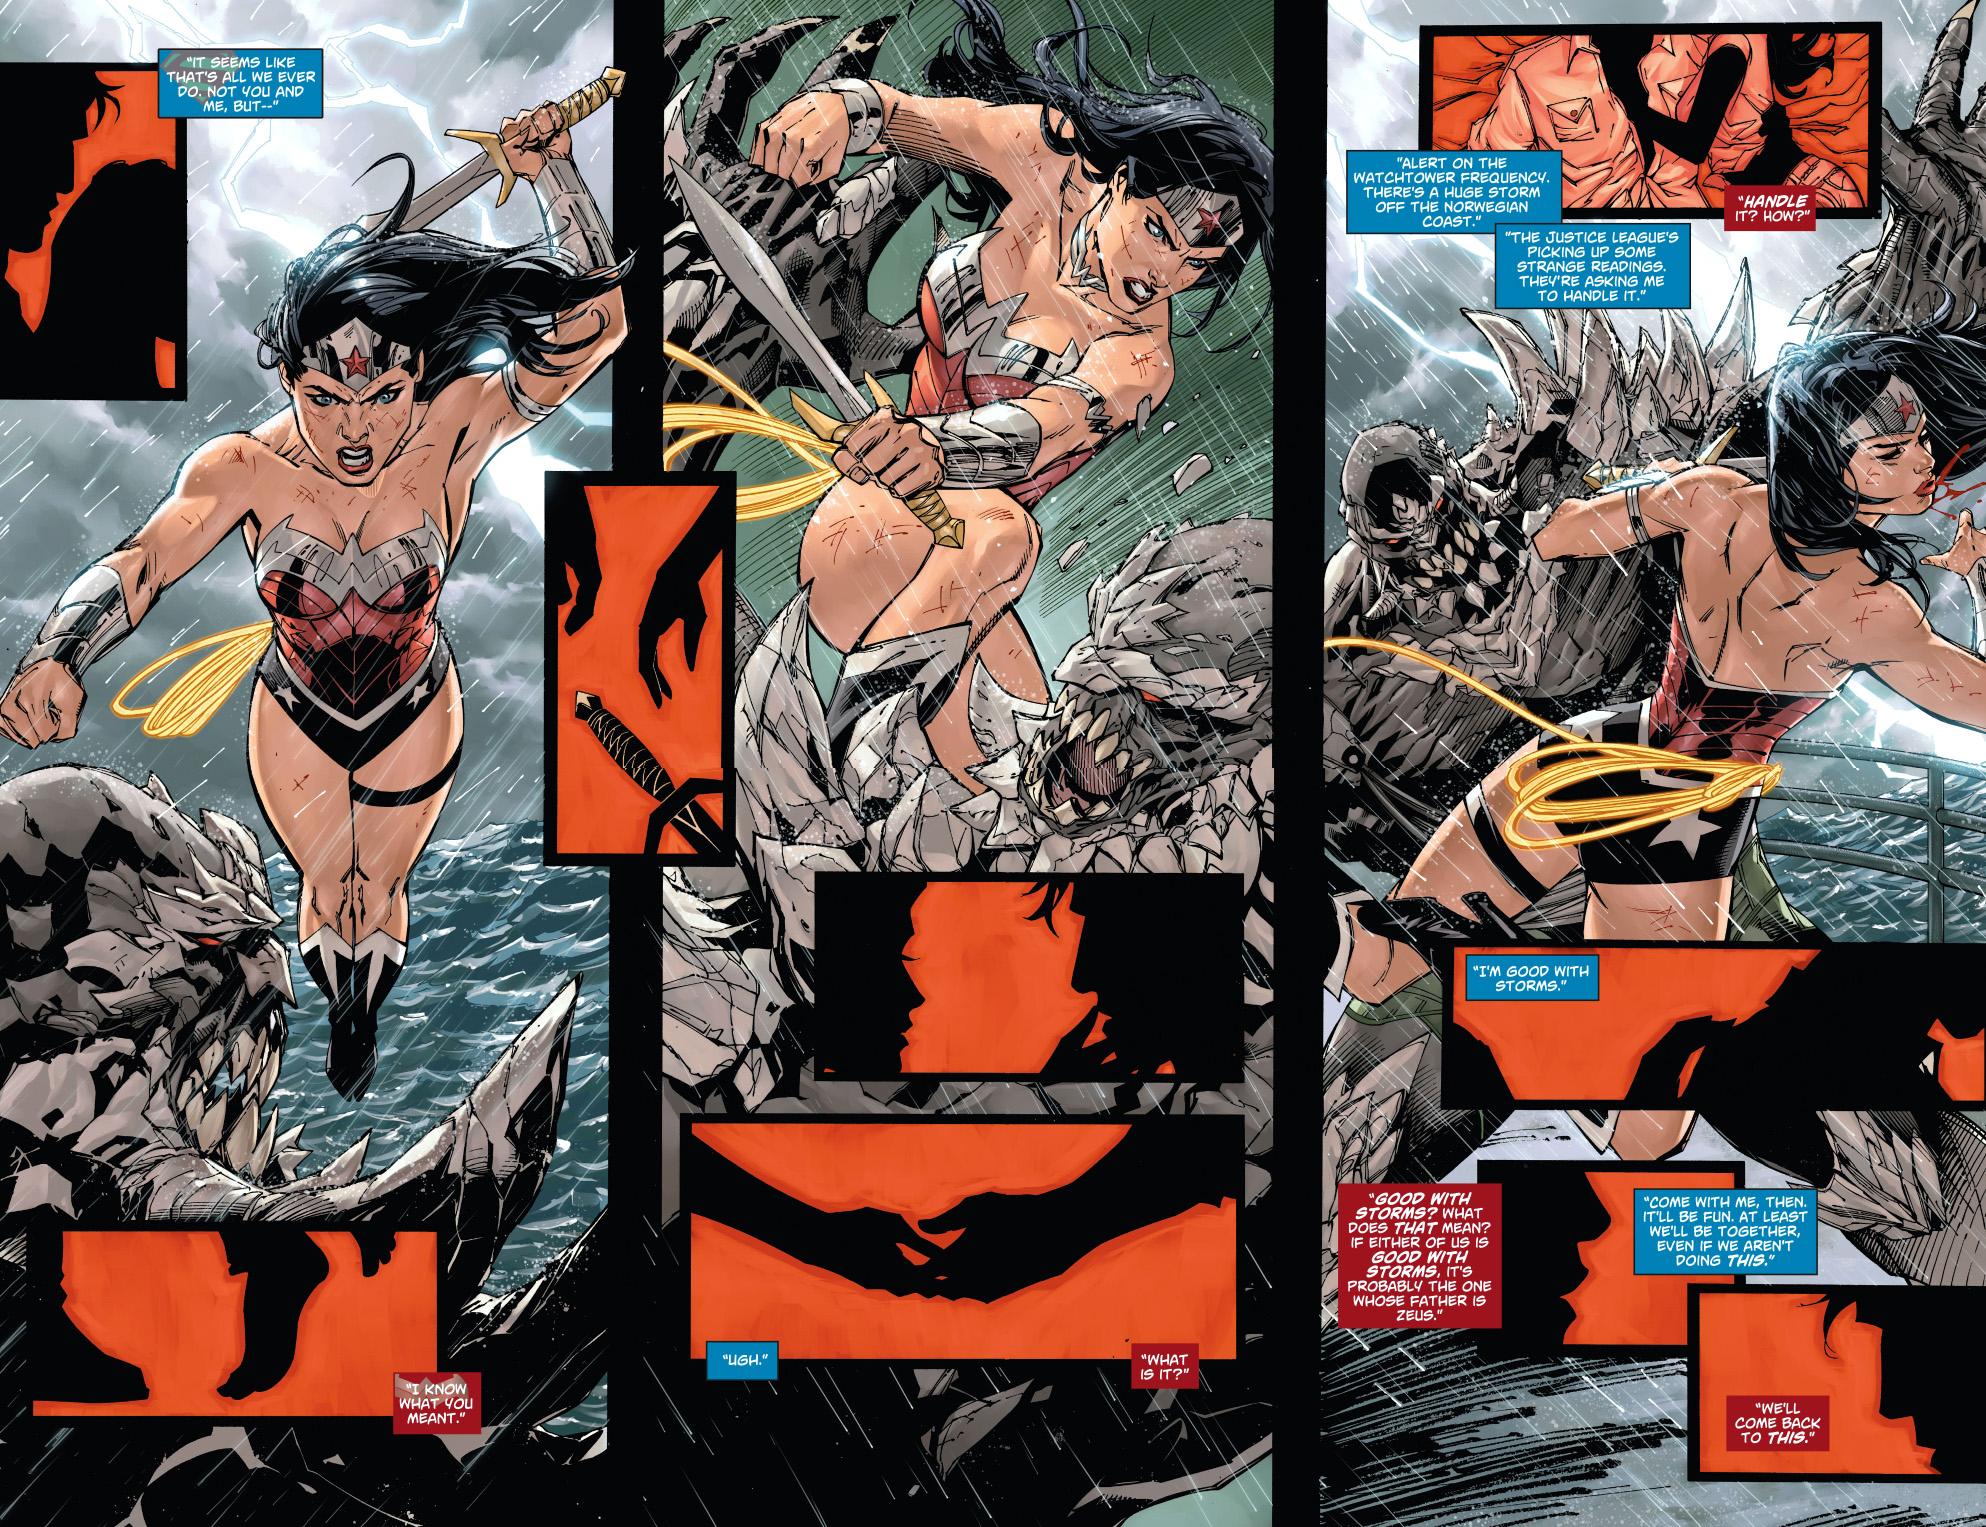 wonder woman vs doomsday (new 52)